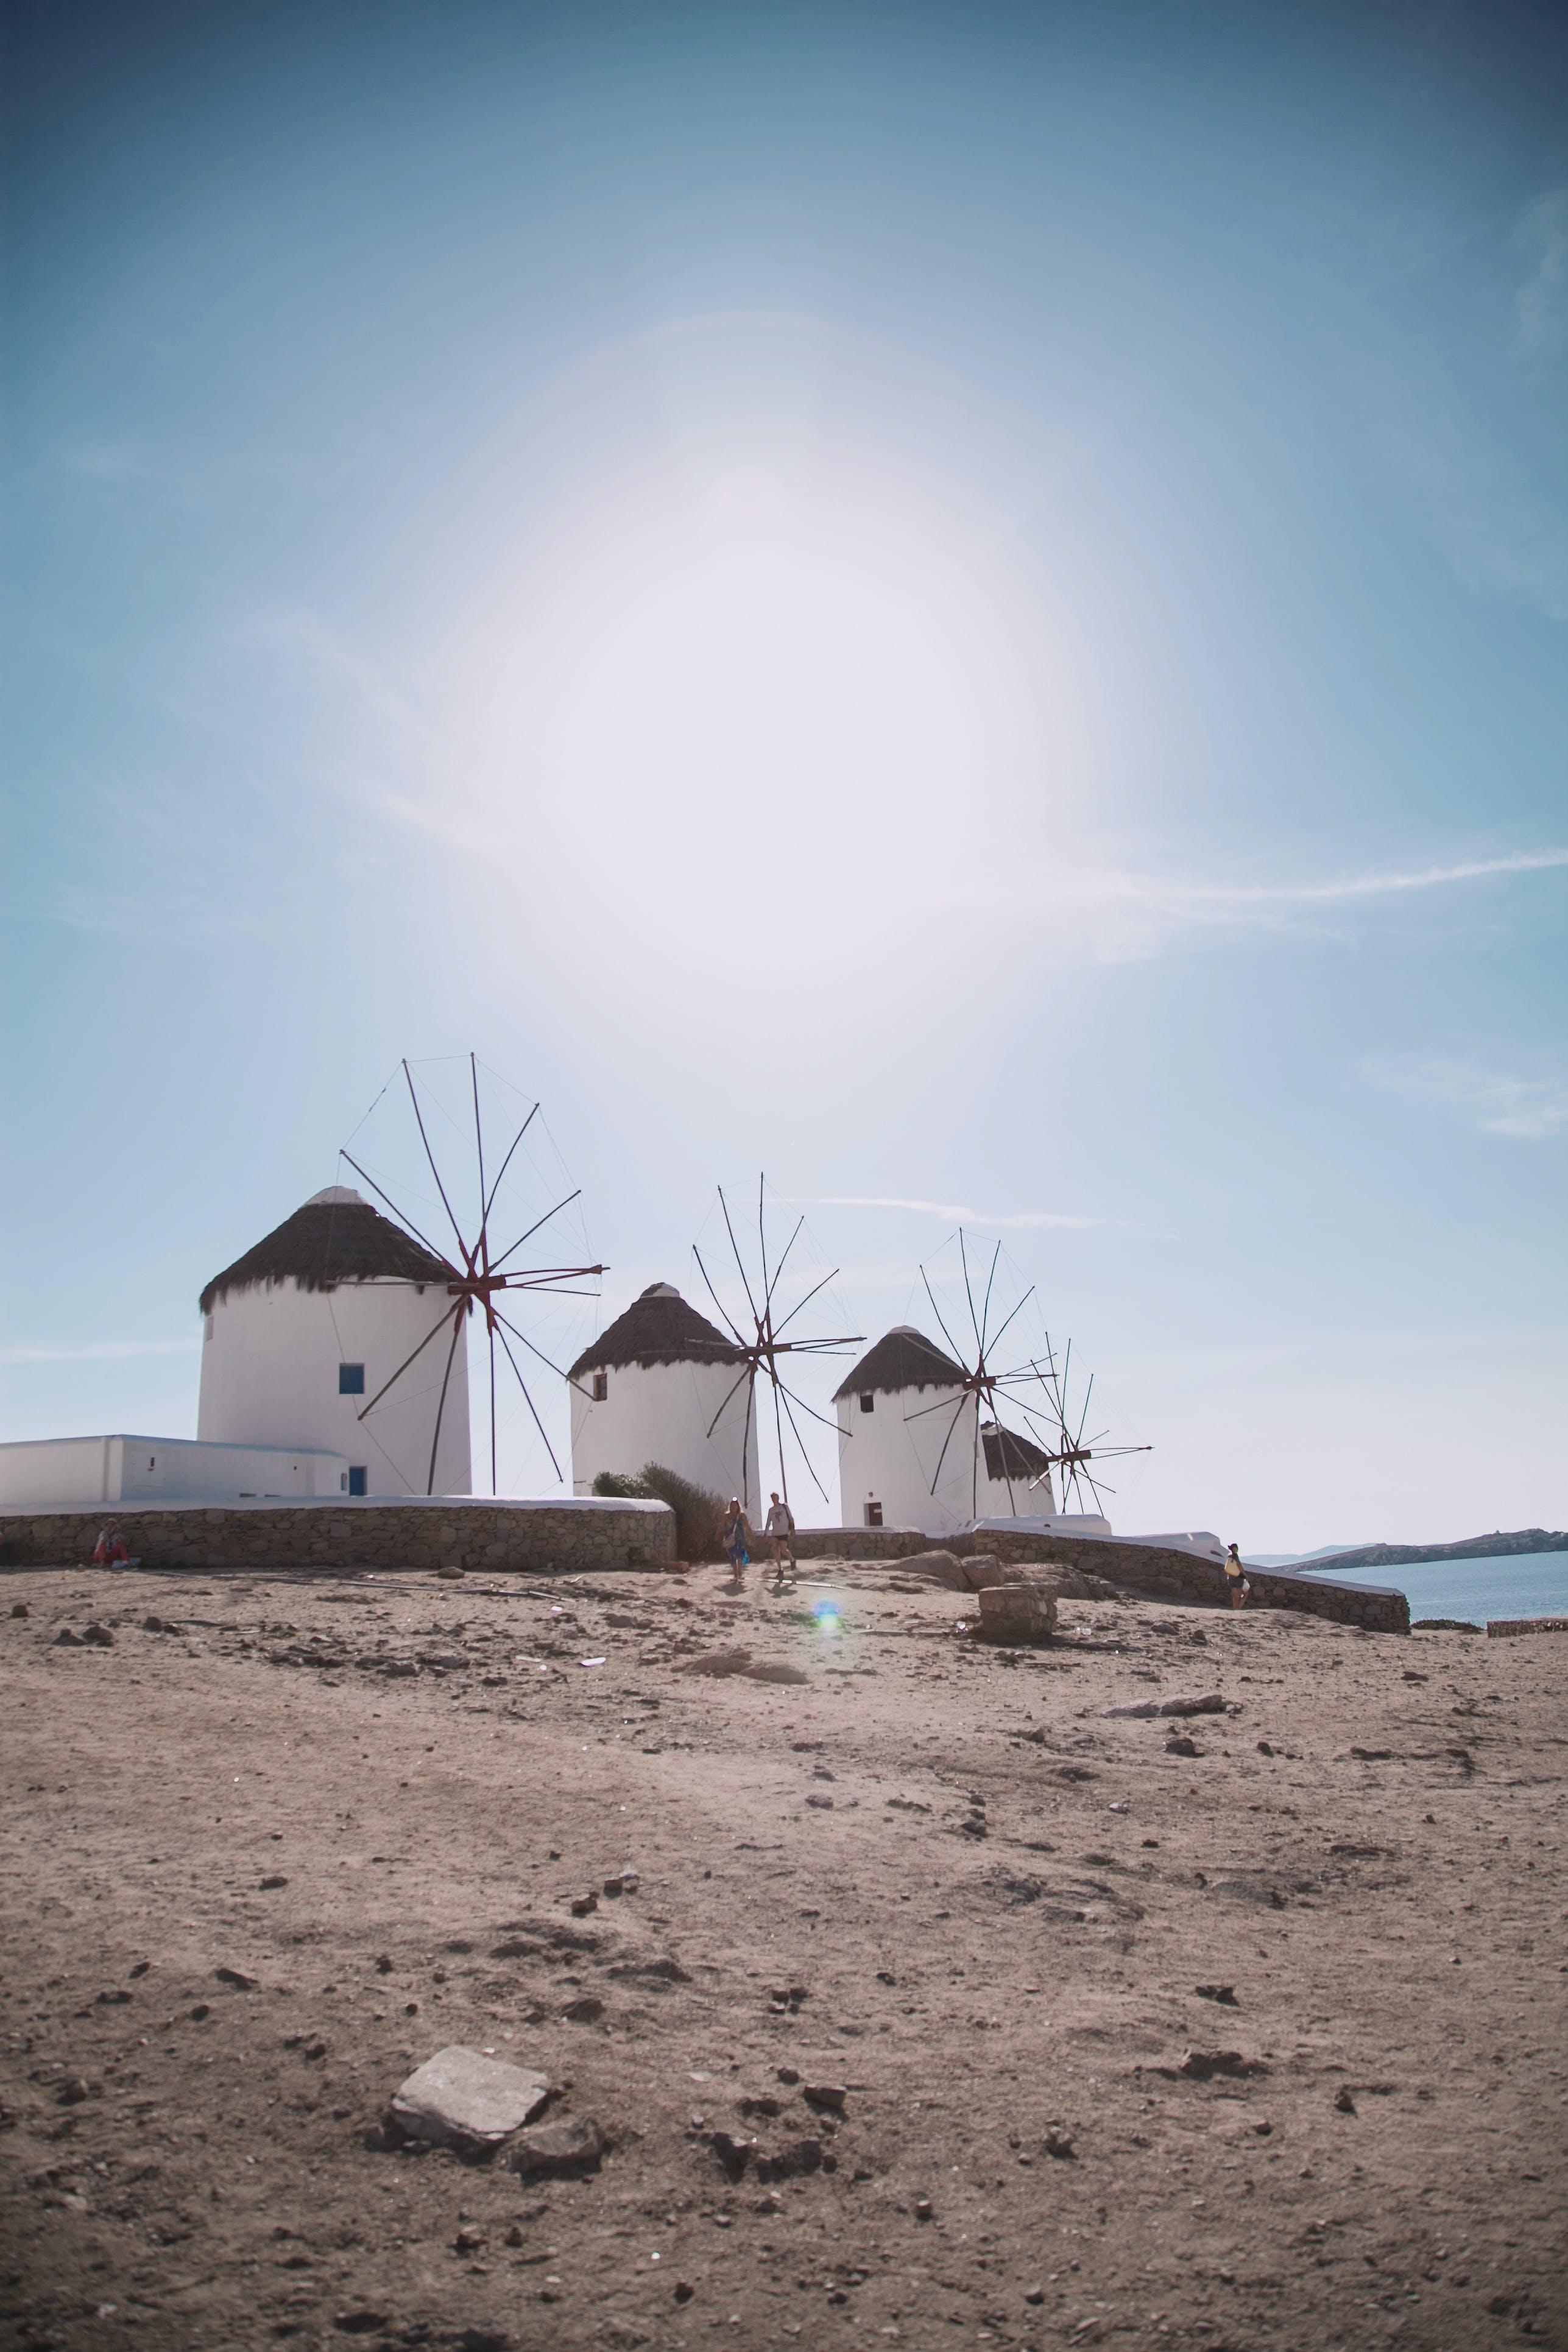 Four Windmills Near Body Of Water